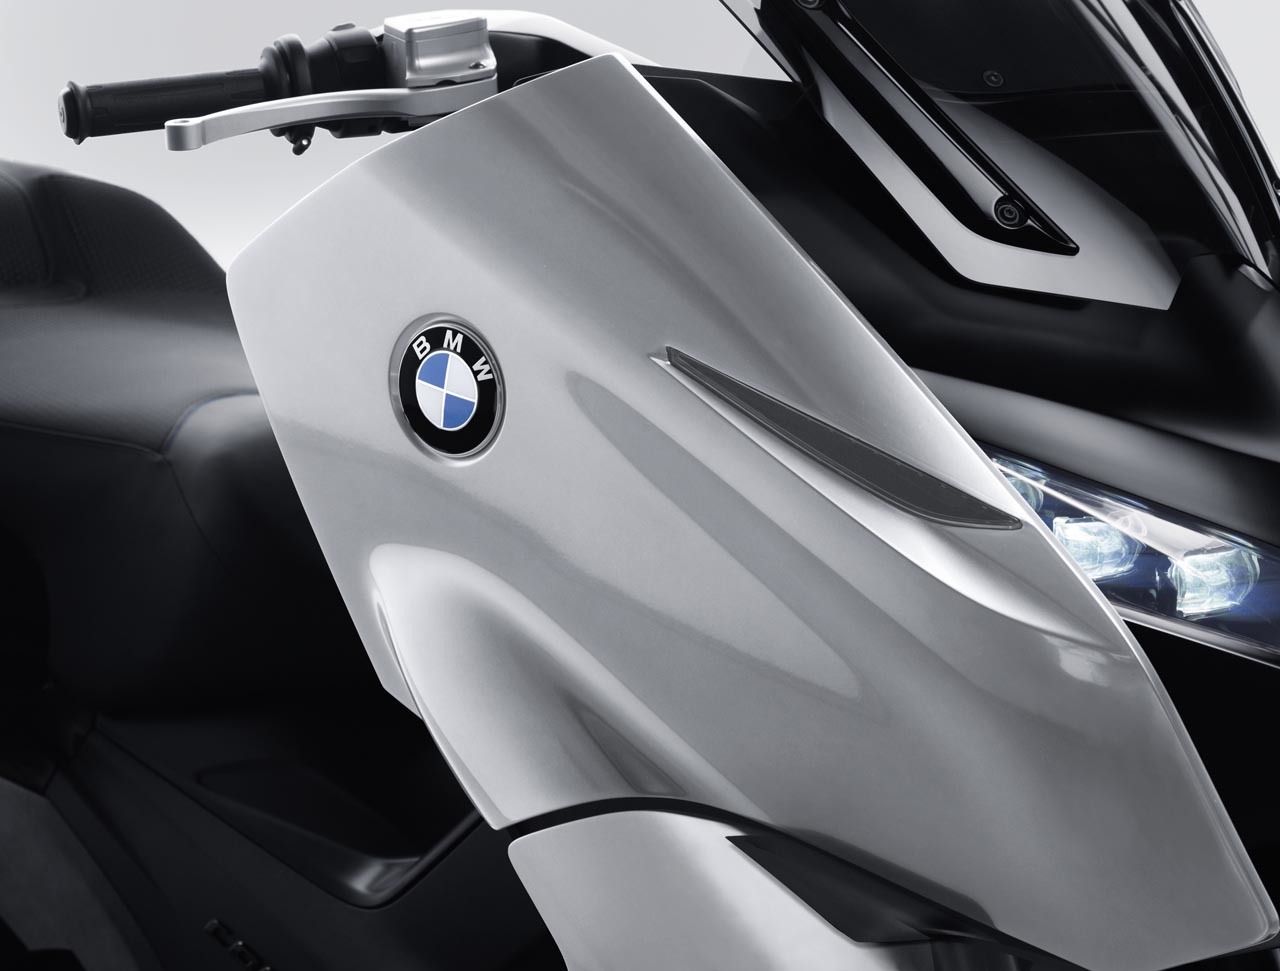 Foto de BMW Concept C Scooter, el Scooter del futuro según BMW (17/19)